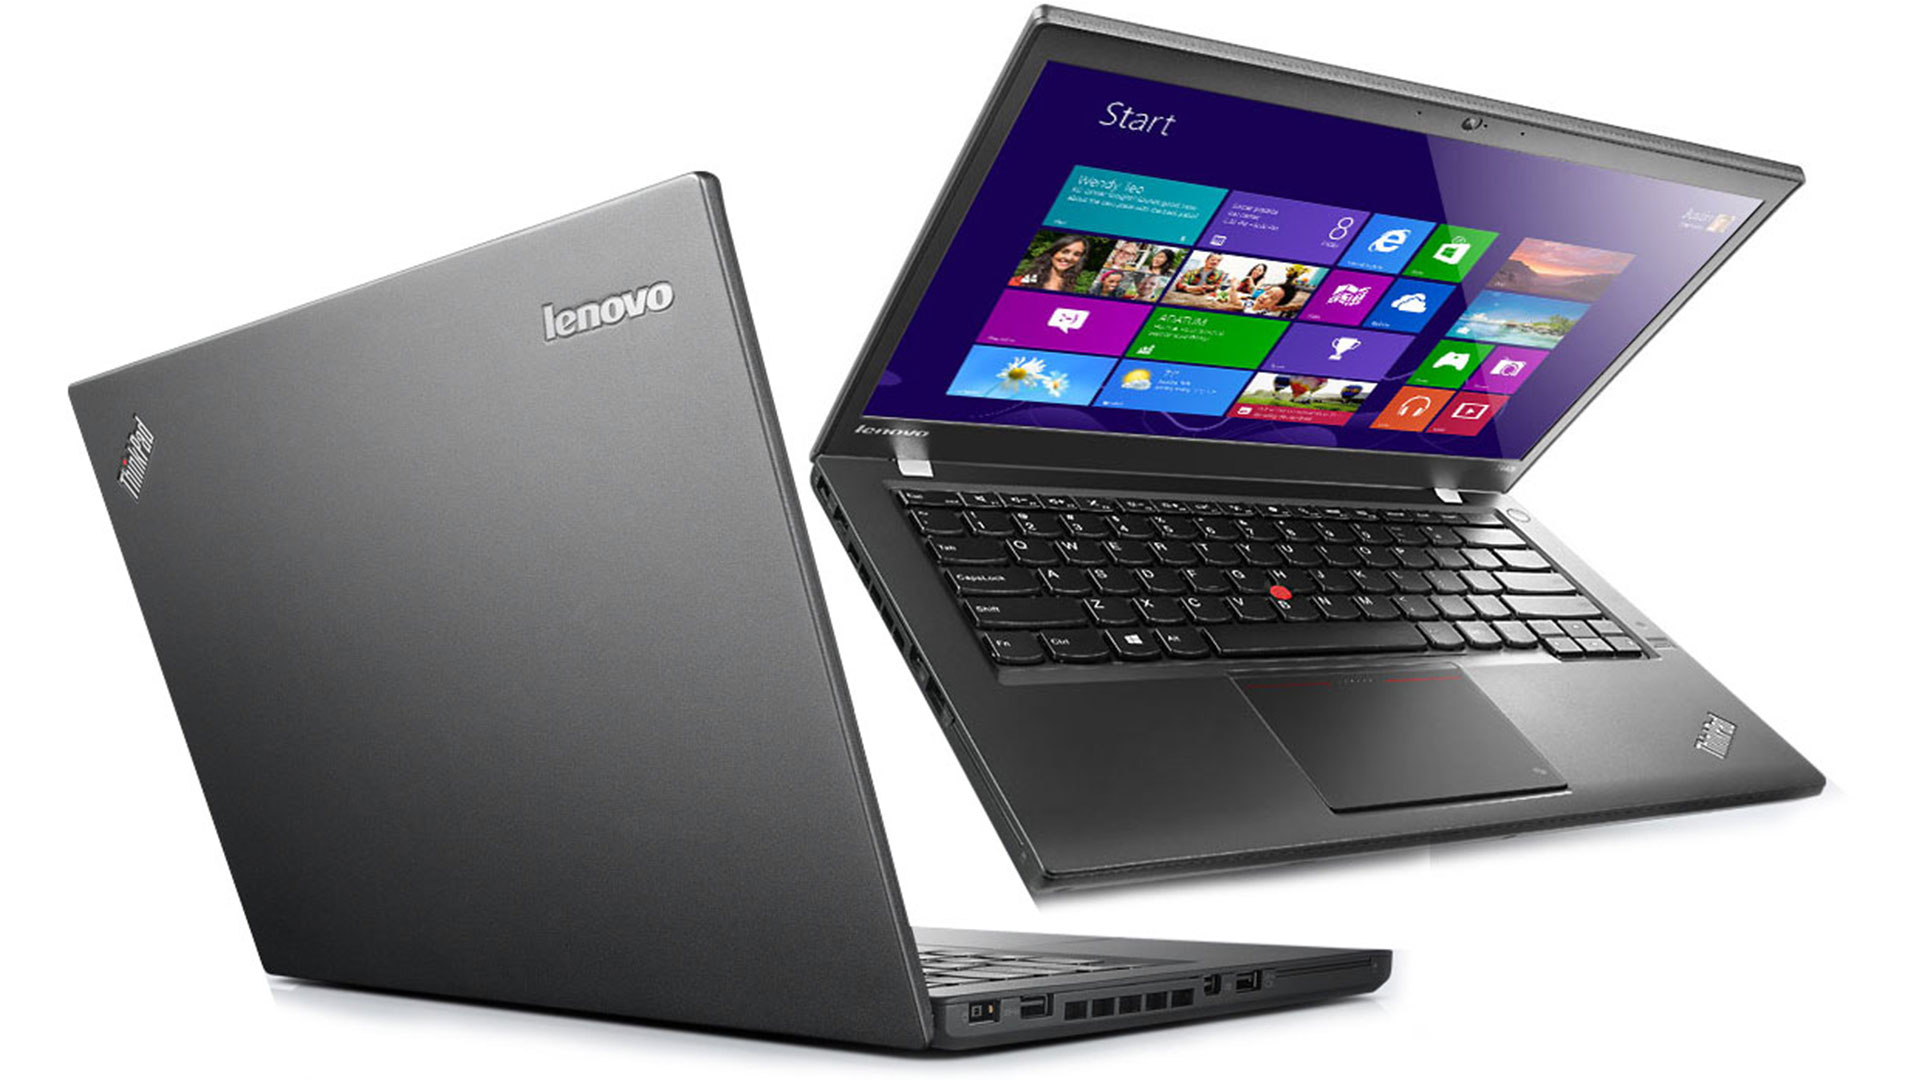 lenovo-thinkpad-t440-20b7a1dnhv-fekete-ultrabook-2